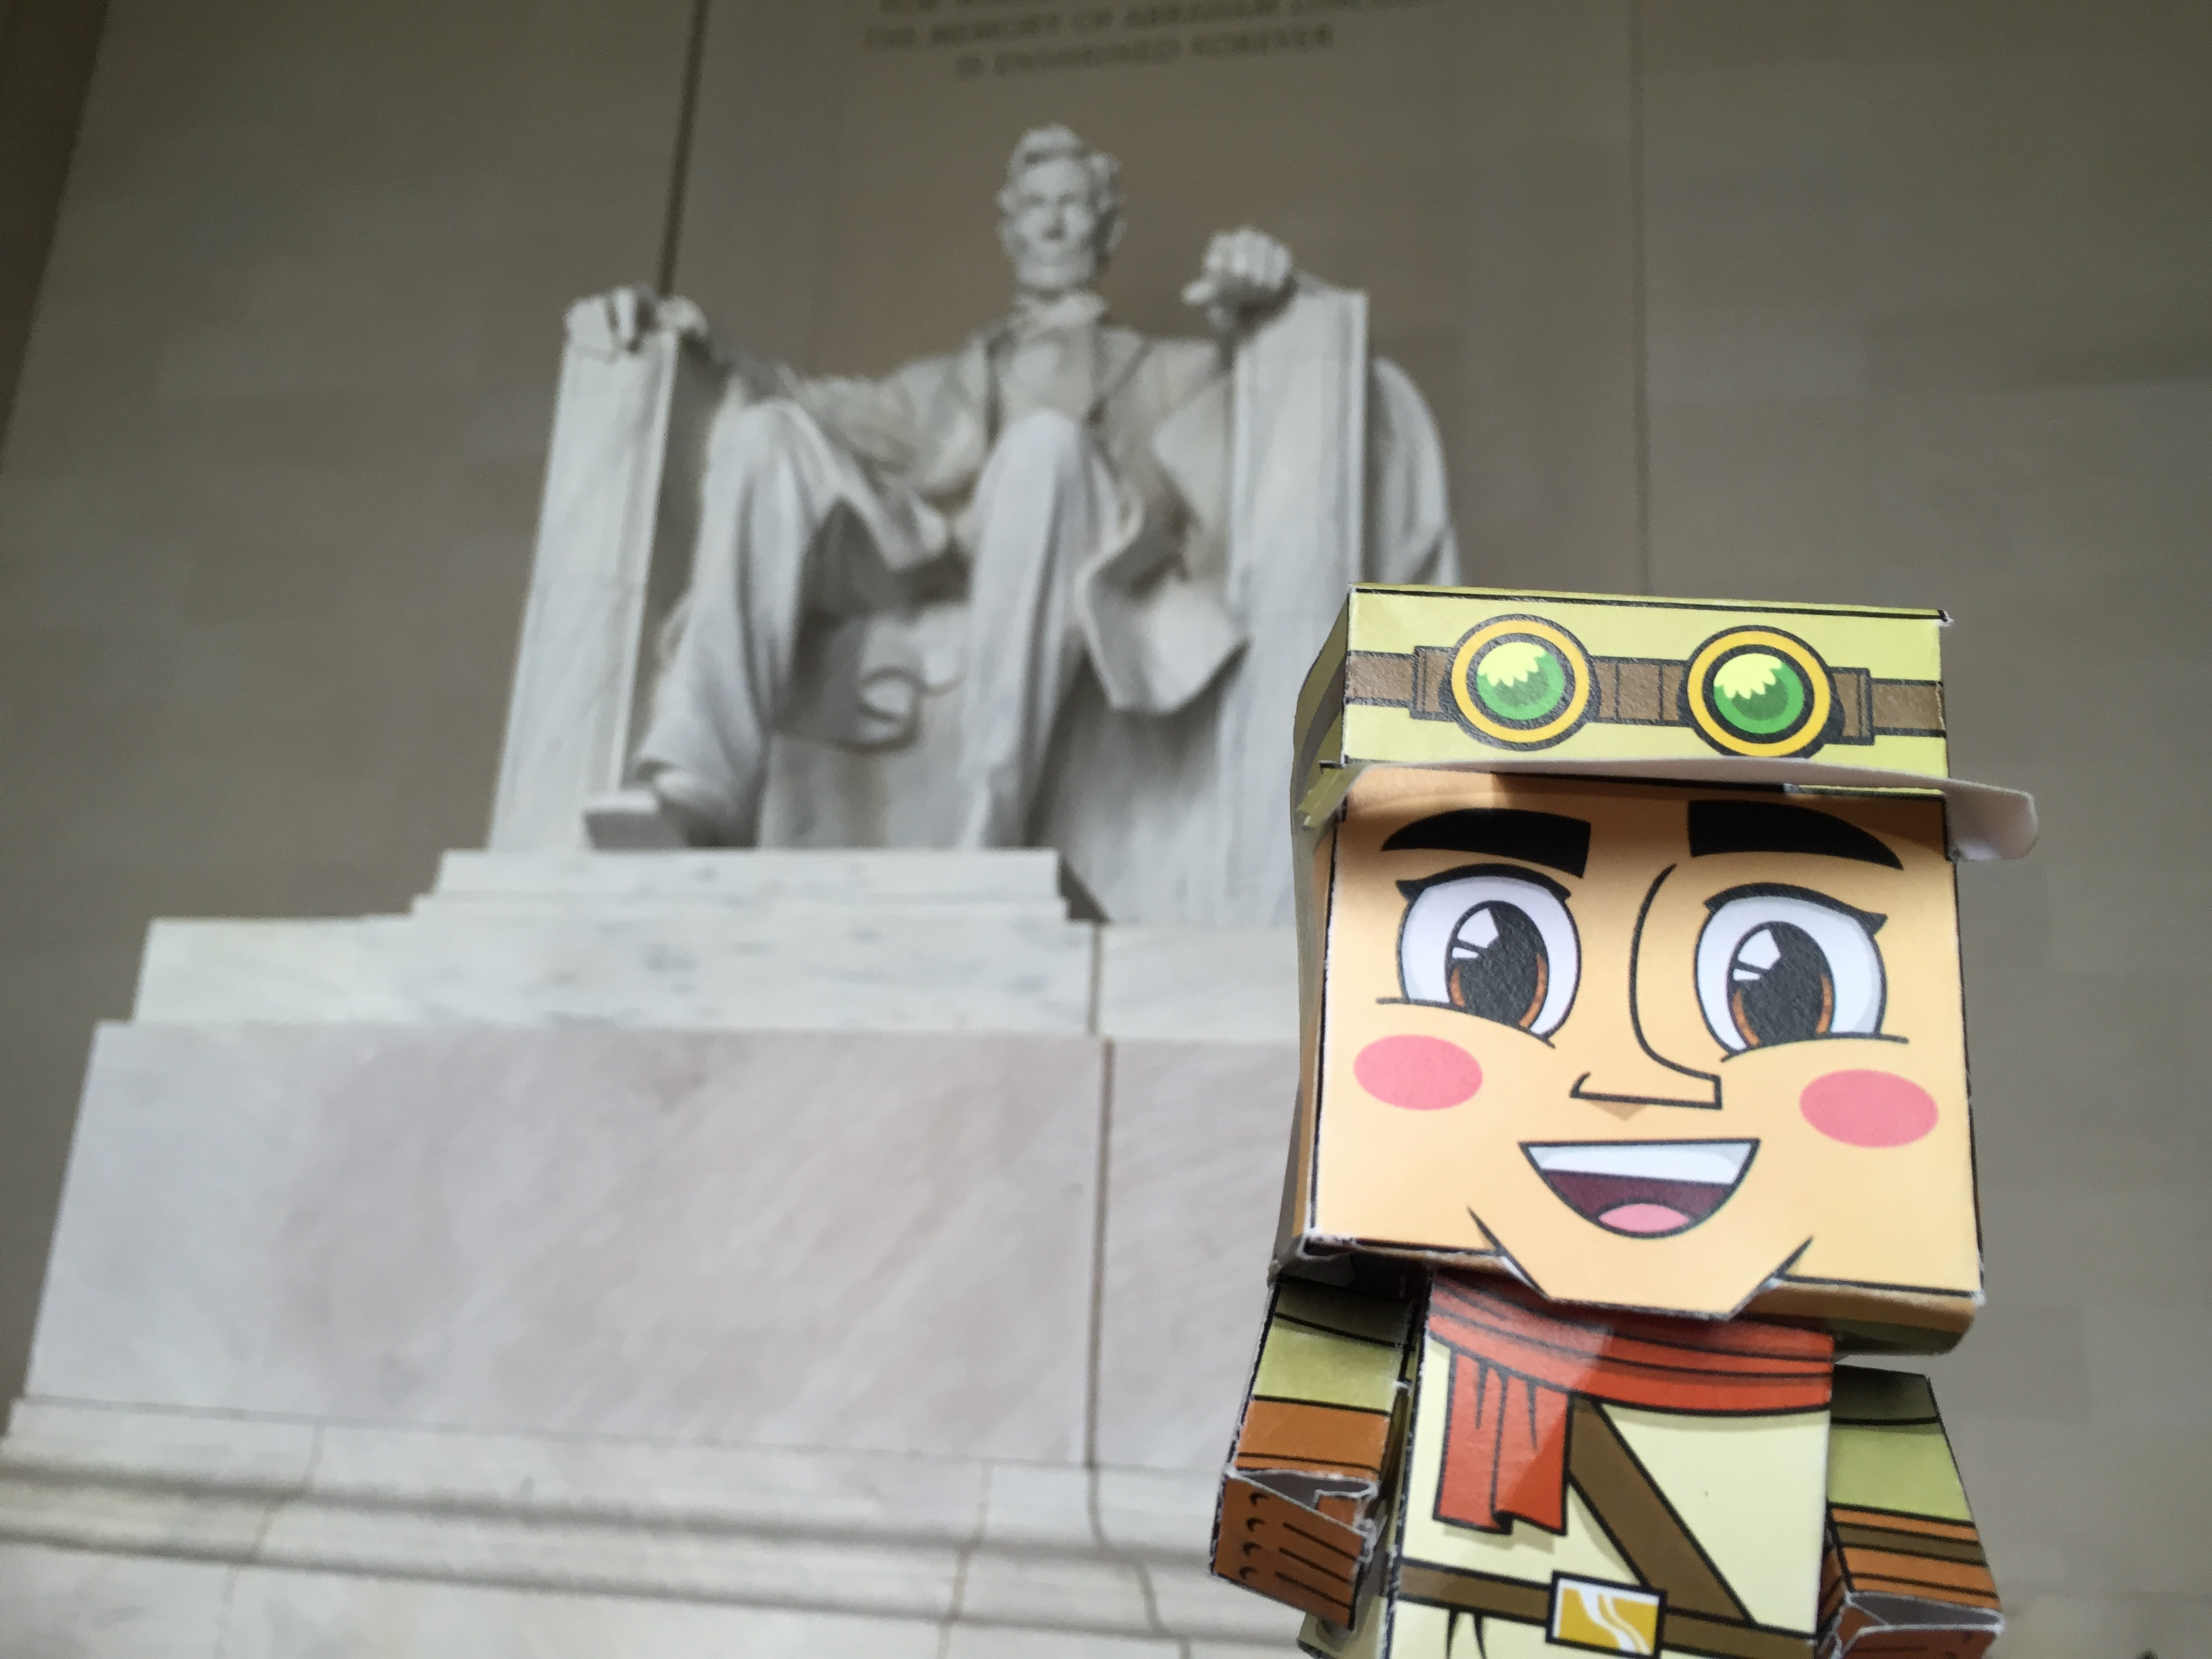 Lincoln Memorial Washington DC Papercraft Literacy Instruction